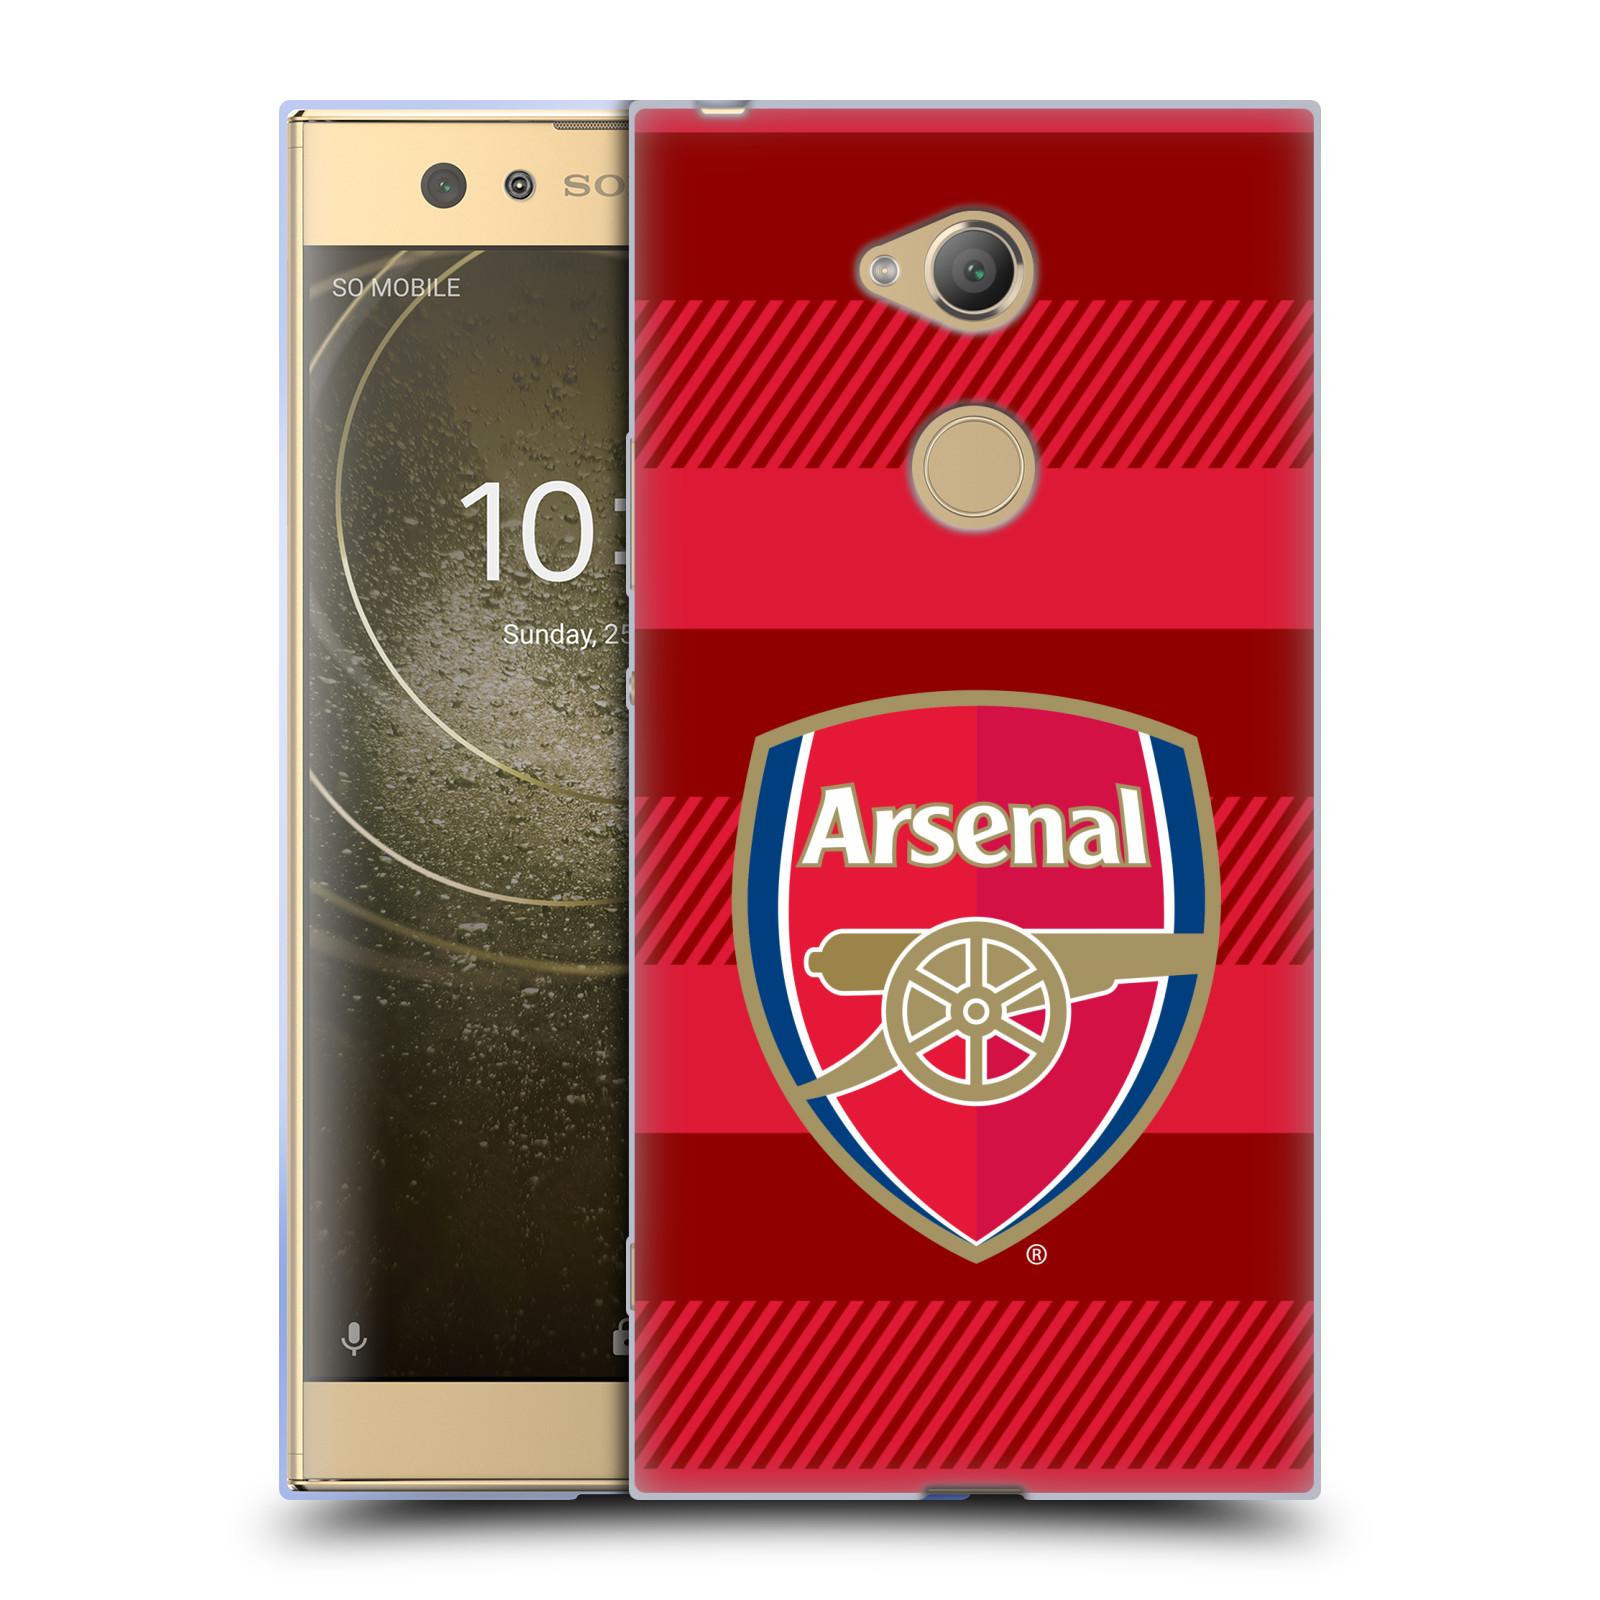 Silikonové pouzdro na mobil Sony Xperia XA2 Ultra - Head Case - Arsenal FC - Logo s pruhy